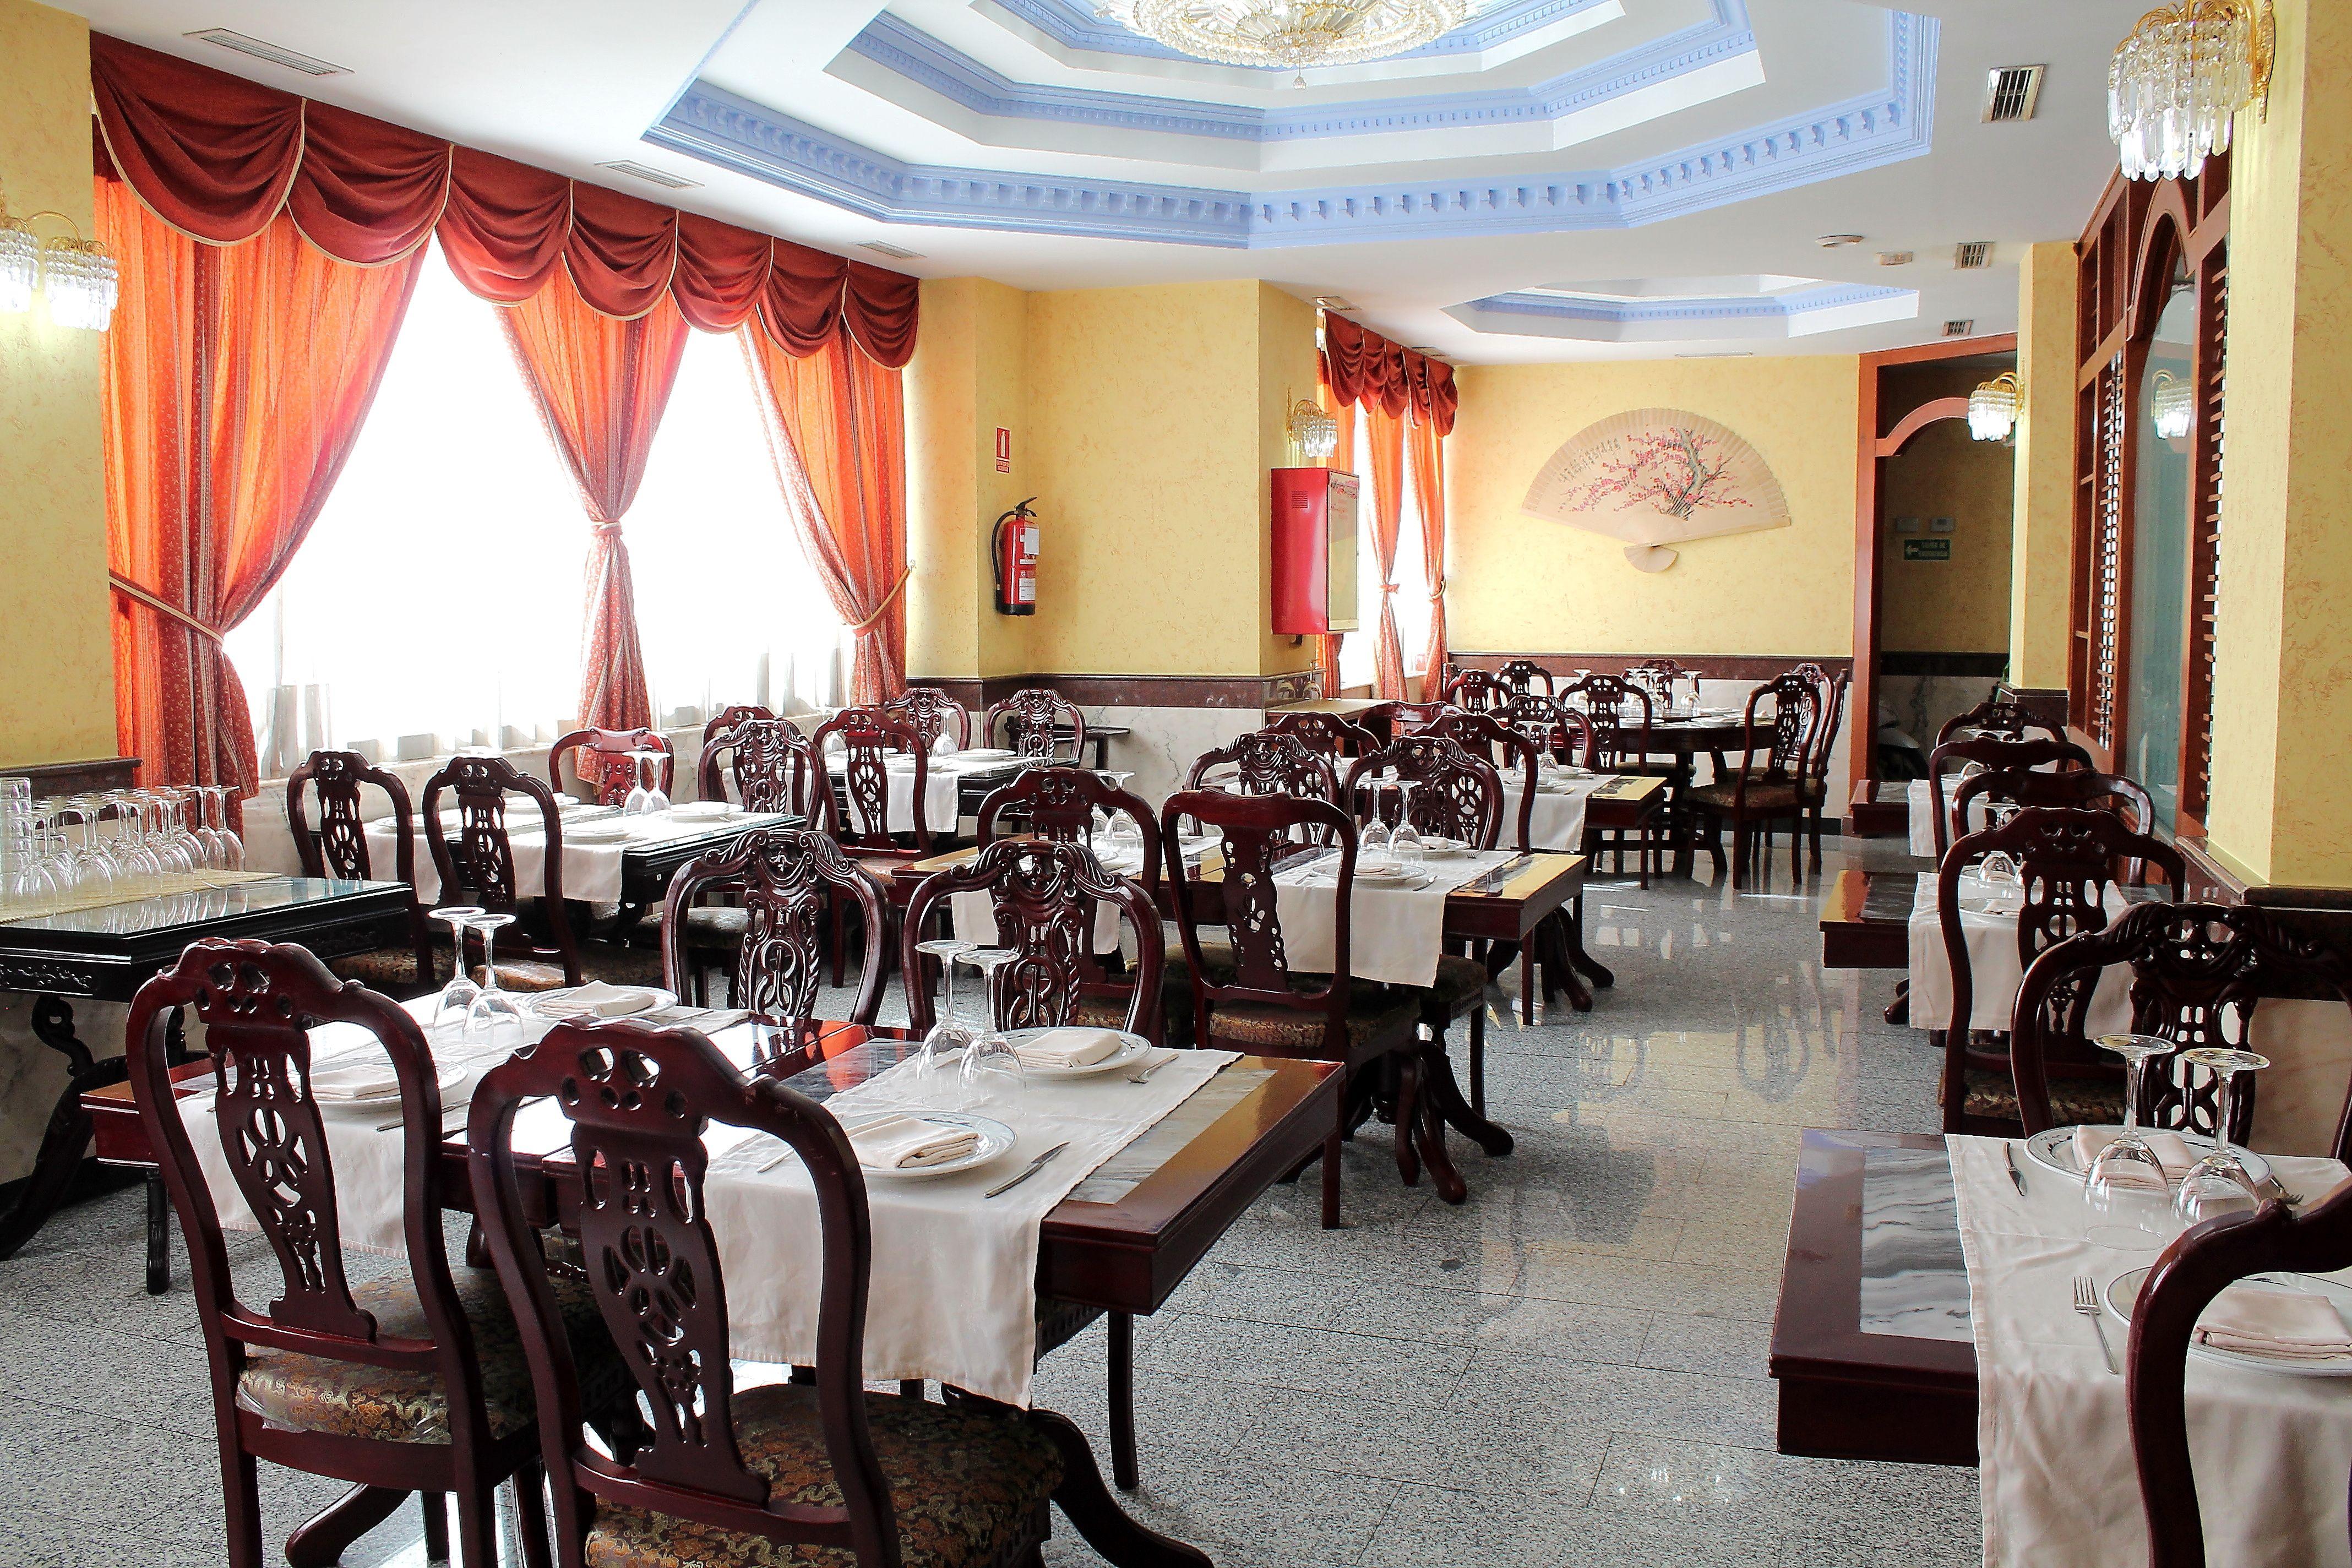 Restaurante Gran Oleada, comida asiática en un amplio local